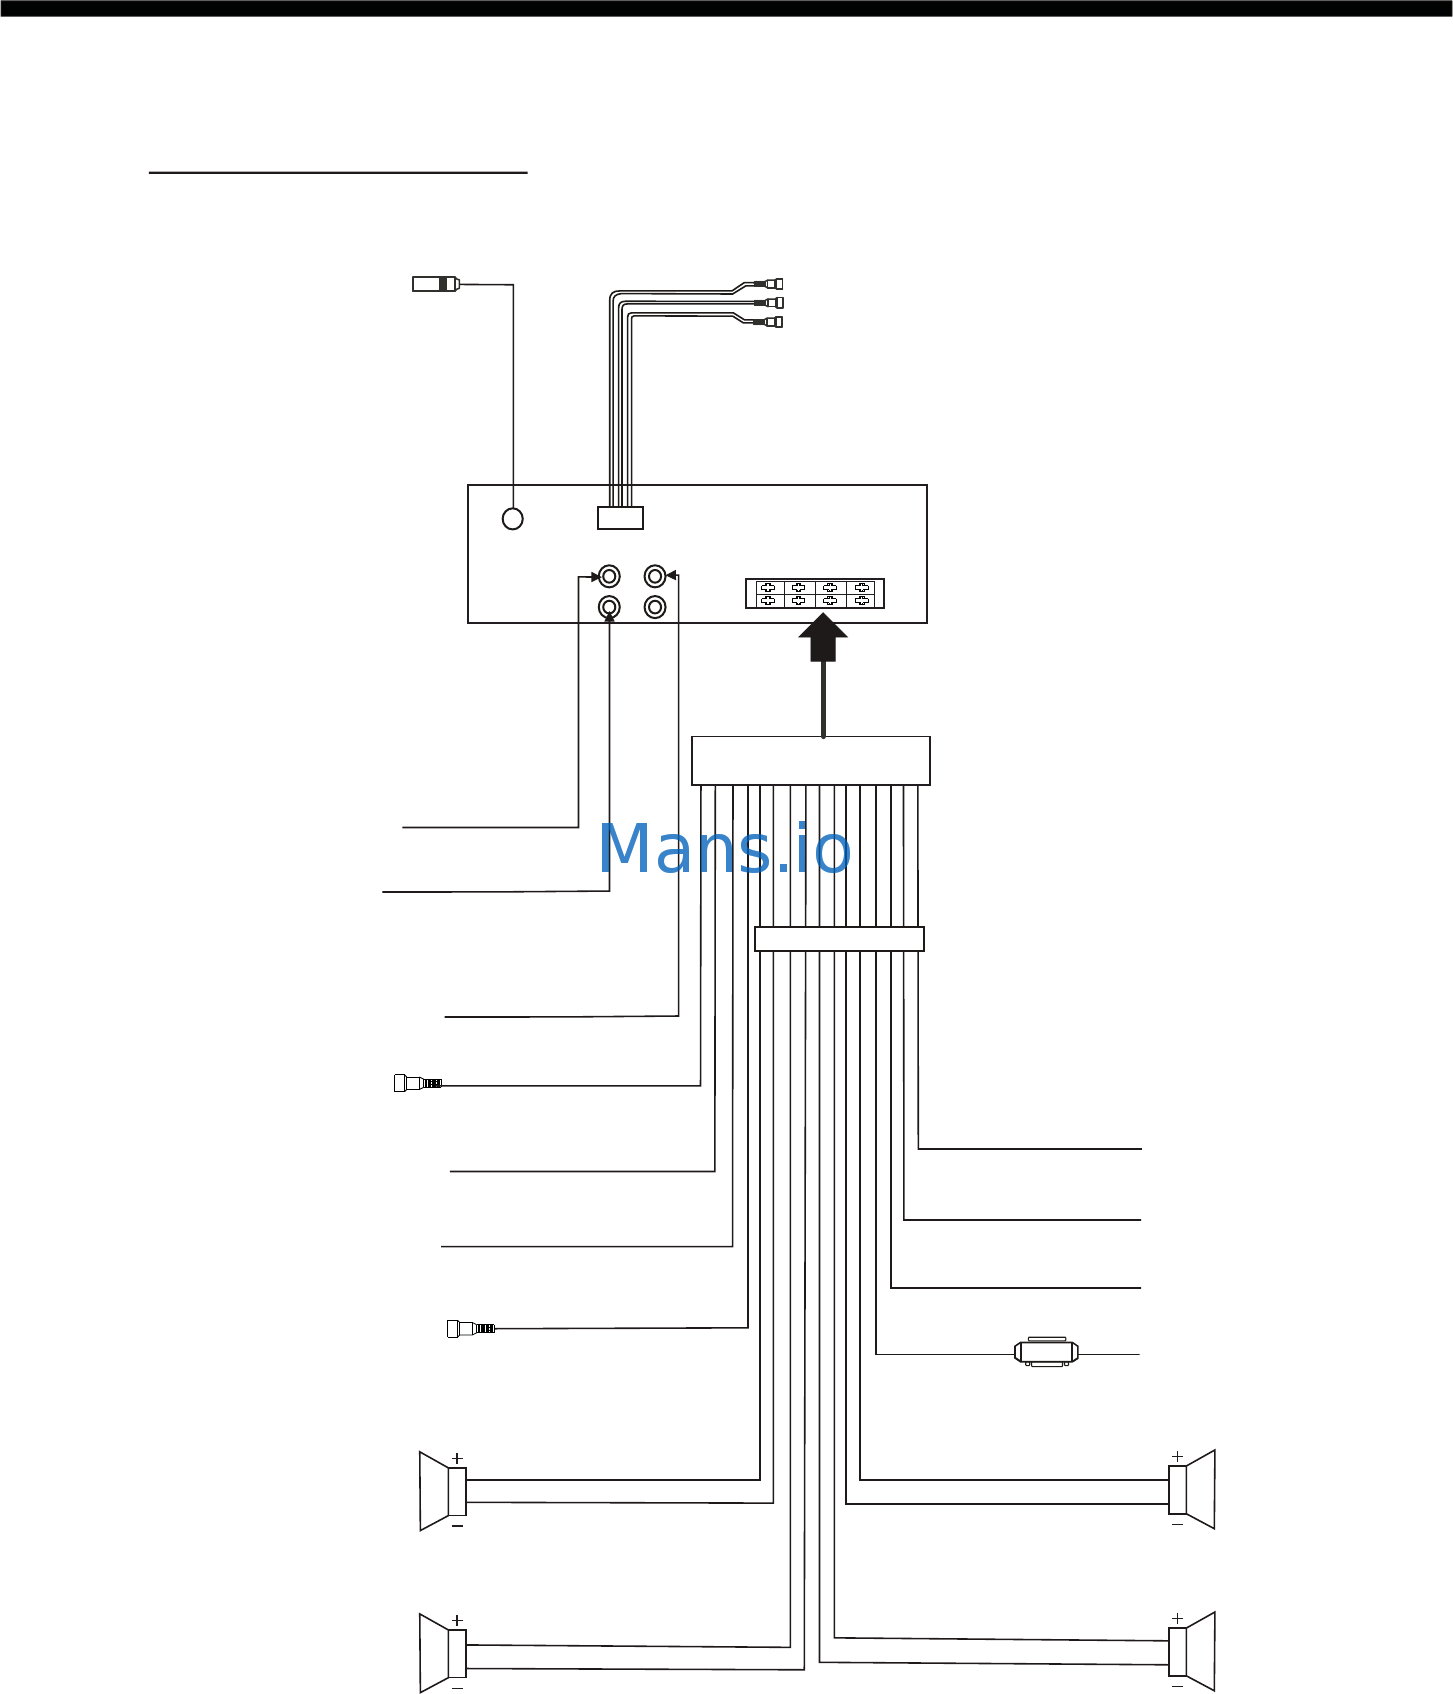 Ssl Dd888 Wiring Harness : 24 Wiring Diagram Images